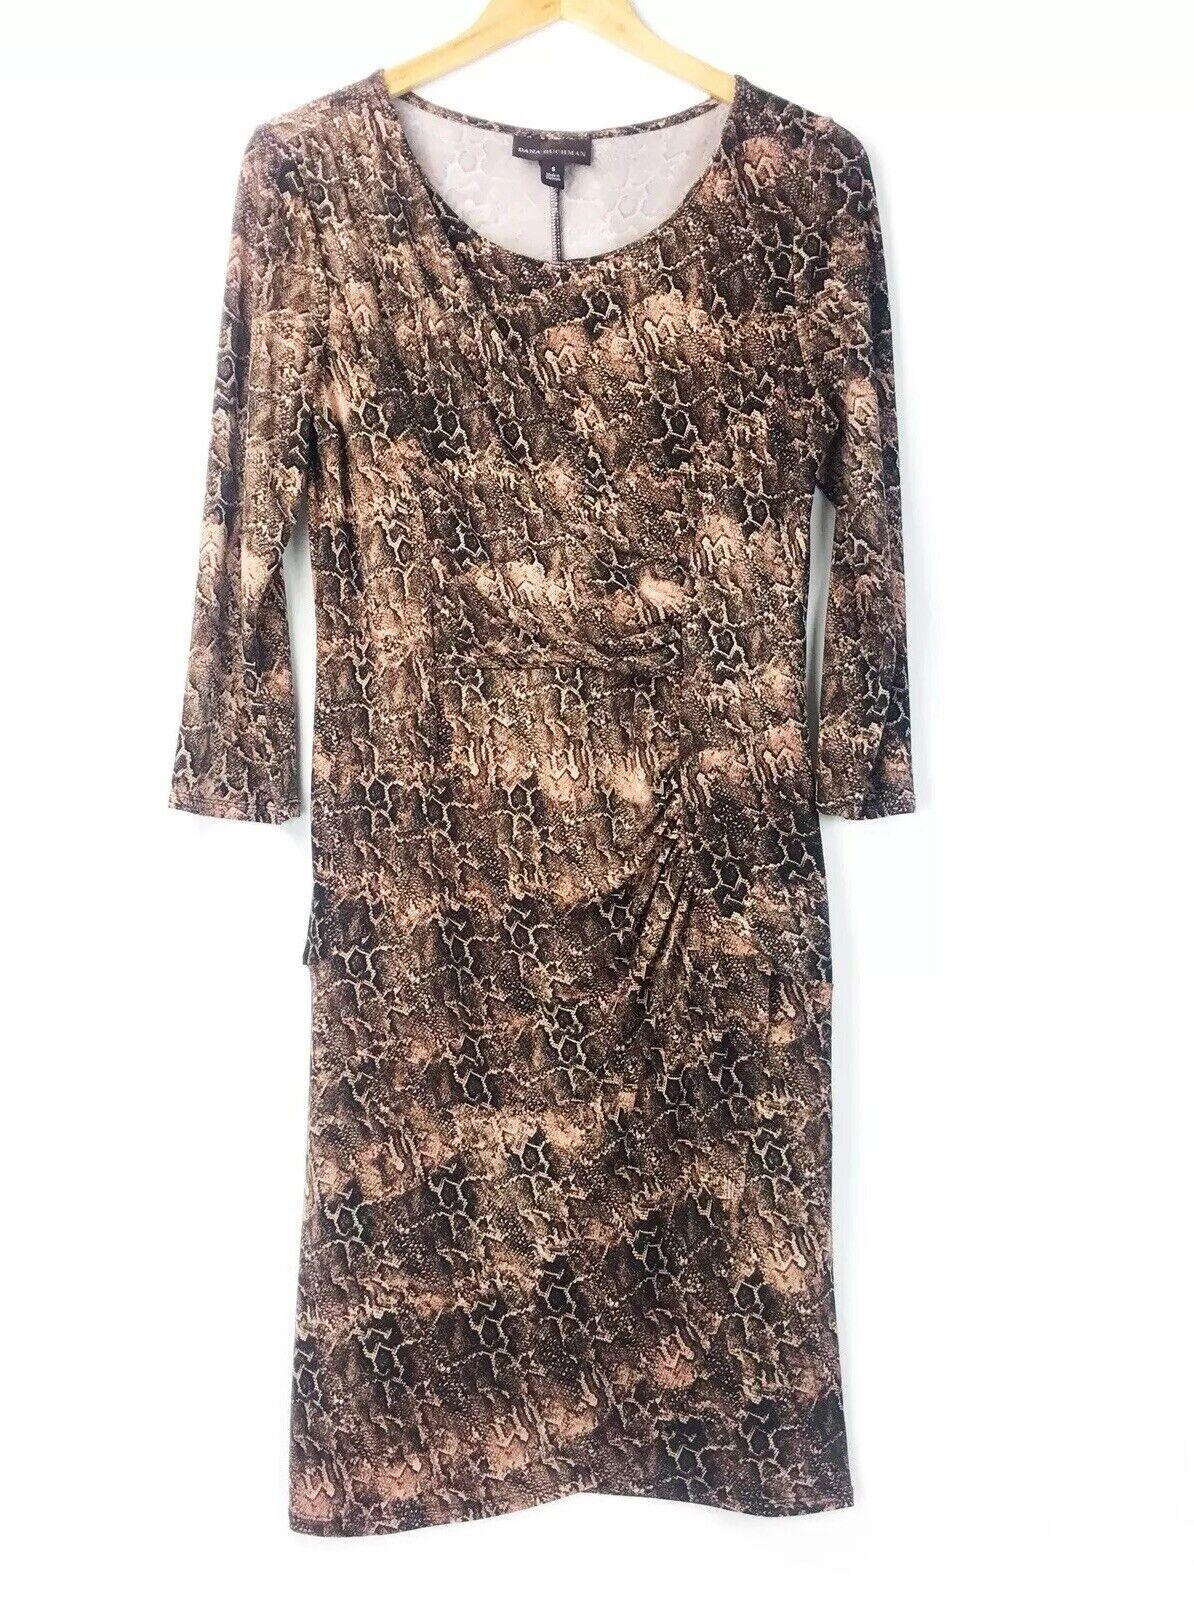 Dana Buchman damen Ruched Dress Größe Small braun Sheath Snakeskin 3 4 Sleeve